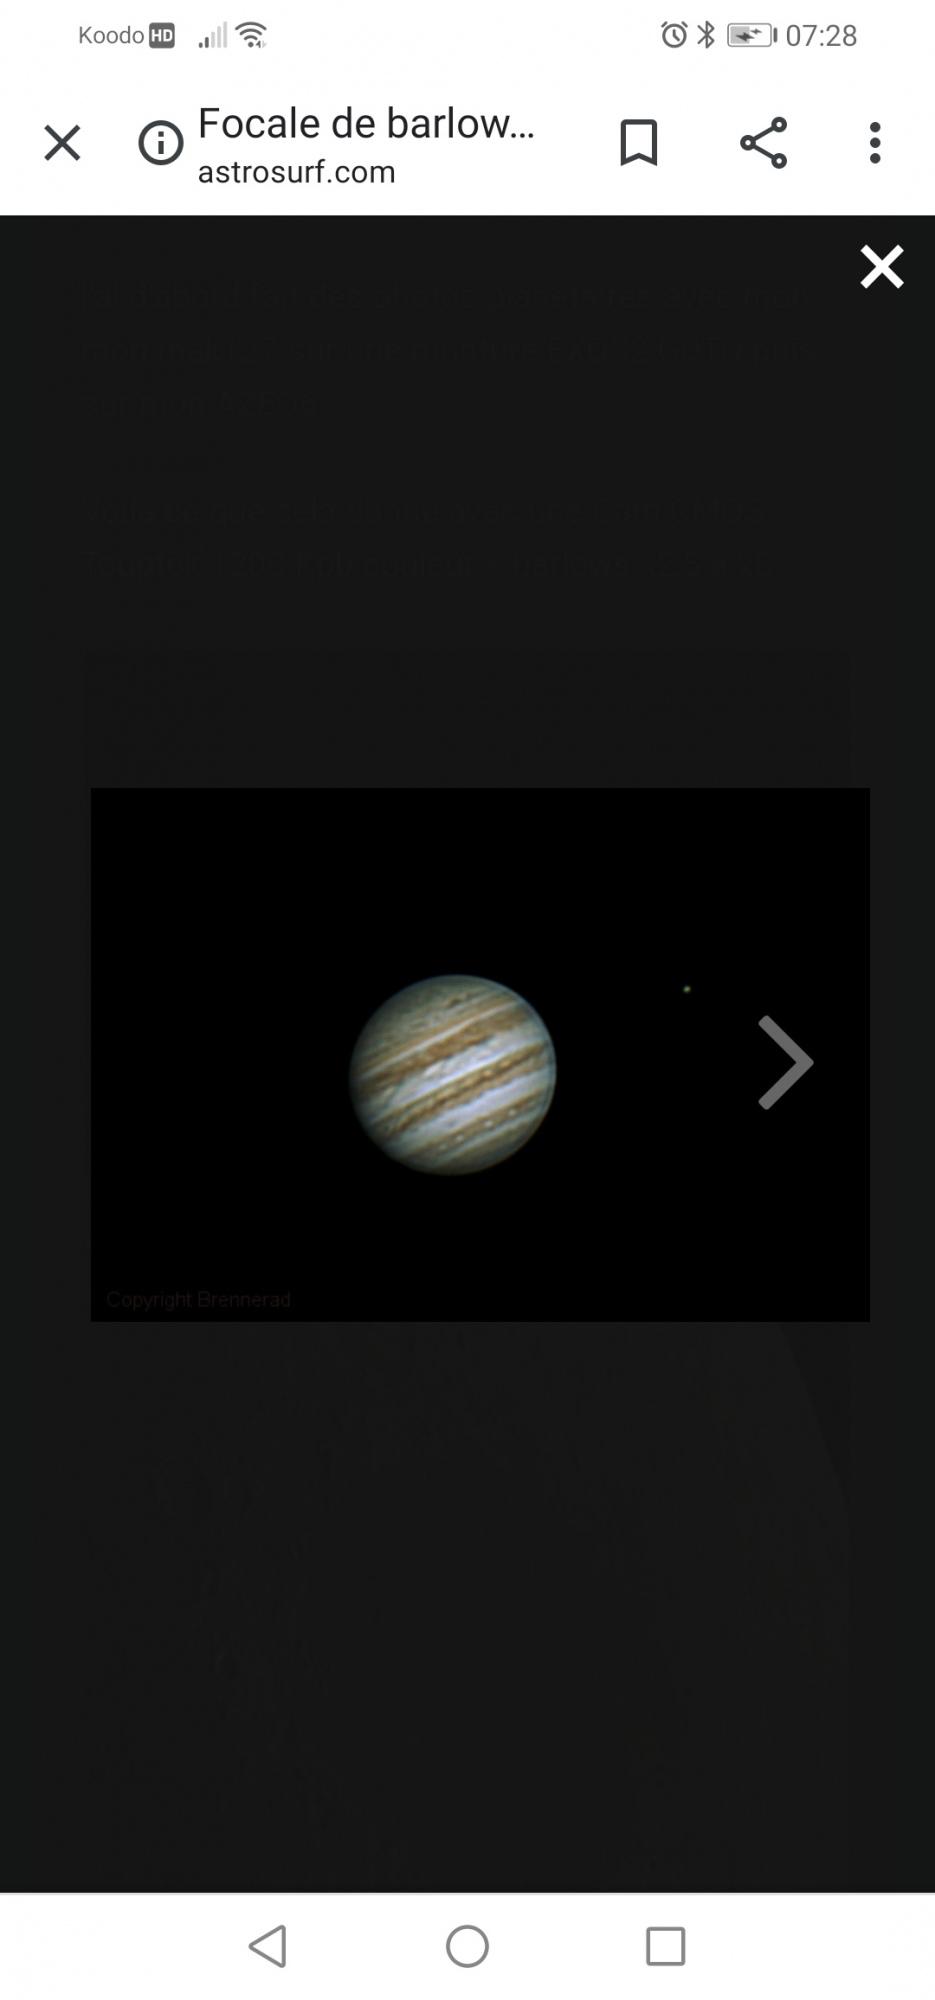 Screenshot_20200810_072800_com.android.chrome.thumb.jpg.c89d1ab50b5674dc67a8550f02ece3ed.jpg